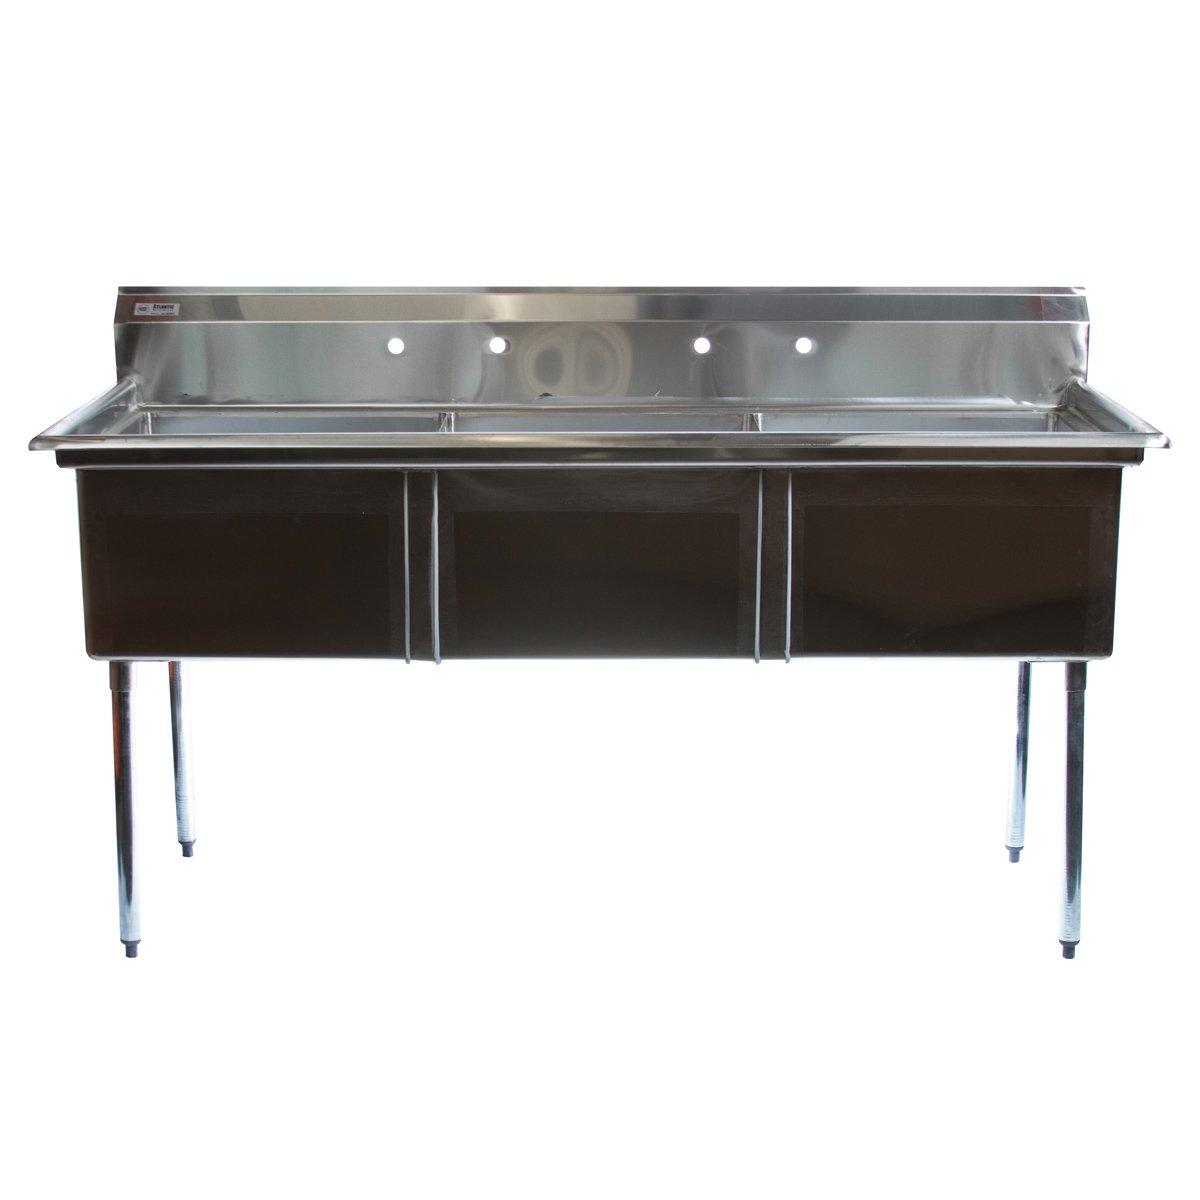 Image of Atlantic Metalworks 3CS-242414-0 - Economy 3 Compartment No Drainboard Sink